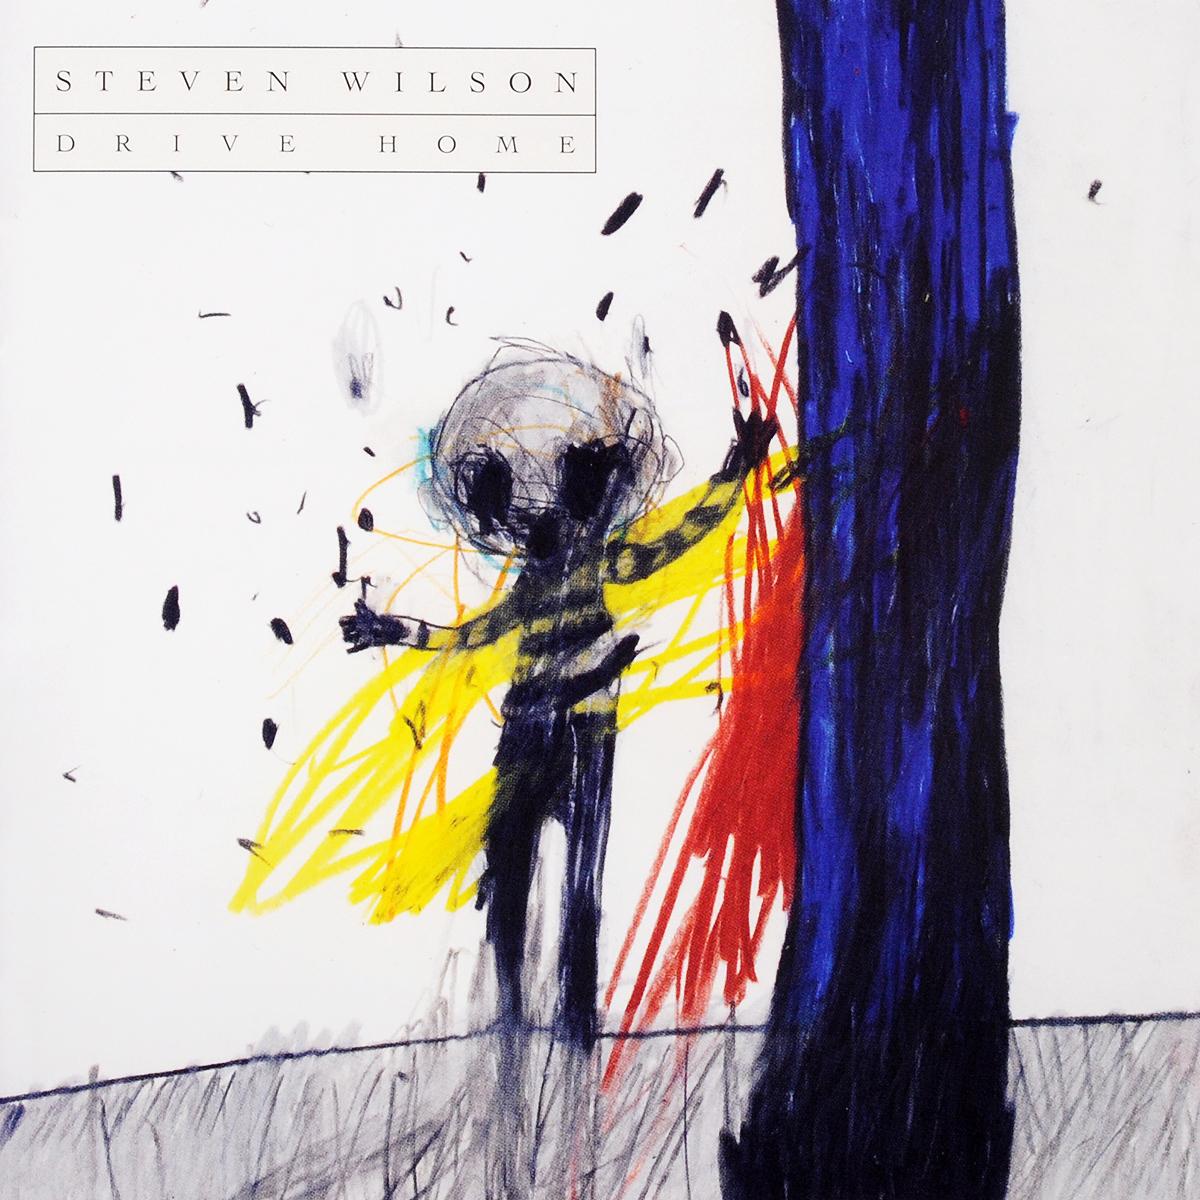 купить Steven Wilson: Drive Home (DVD + CD) по цене 1919 рублей